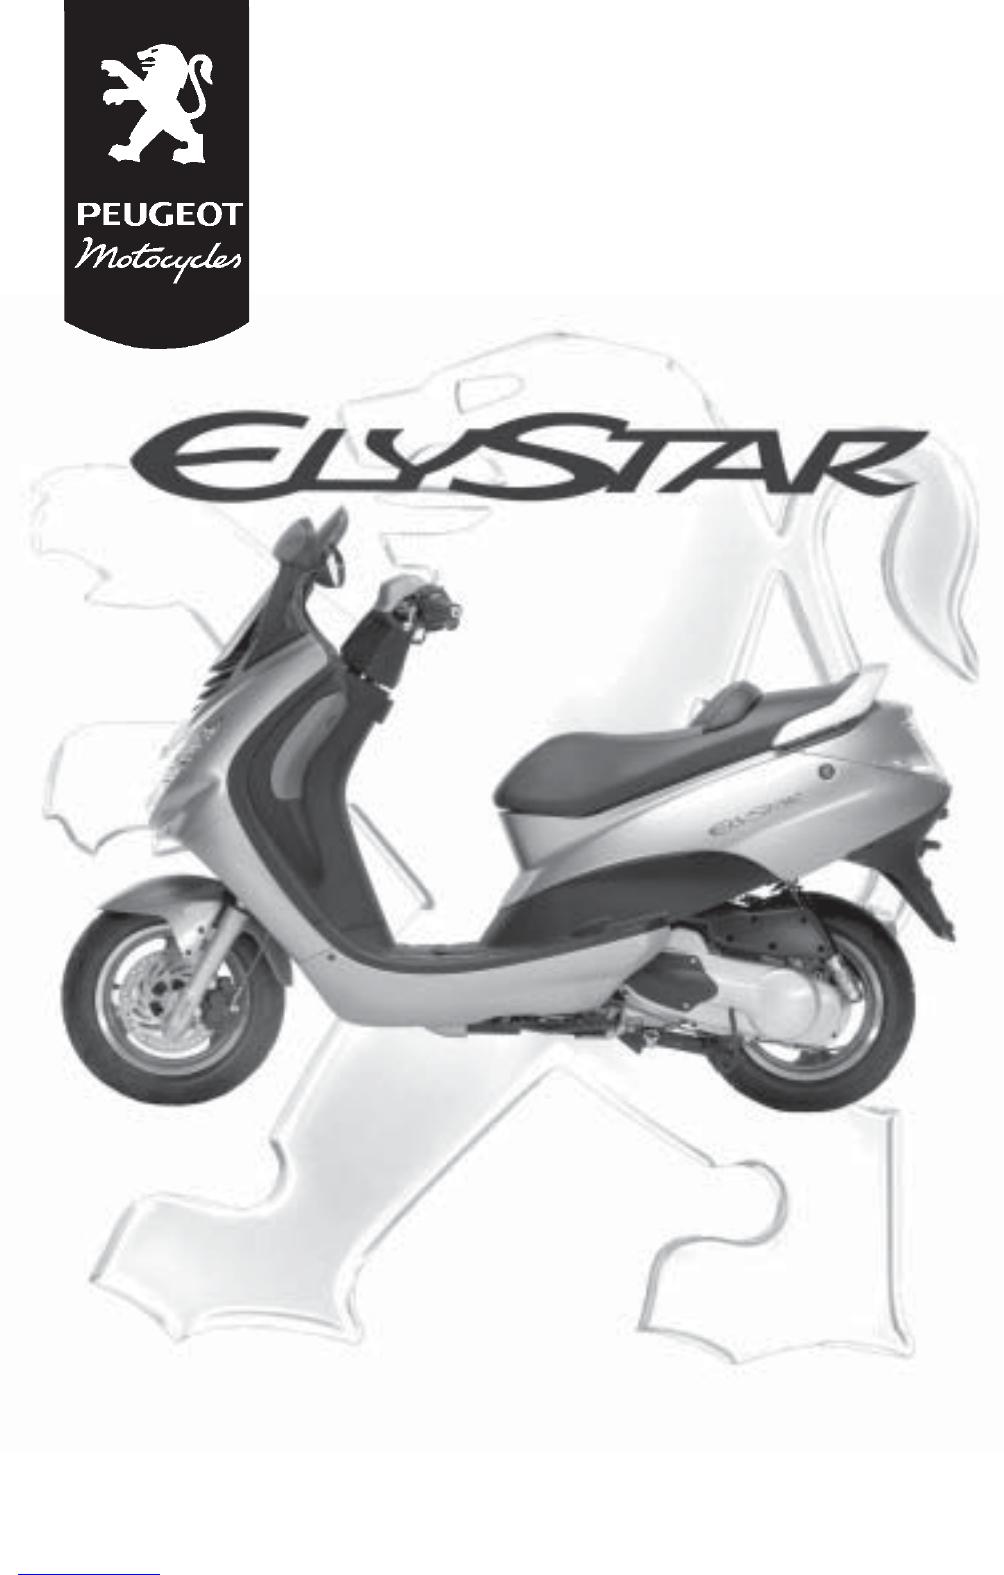 Peugeot Elystar Wiring Diagram Libraries Looxor 50 Librarypeugeot Adv 4temps